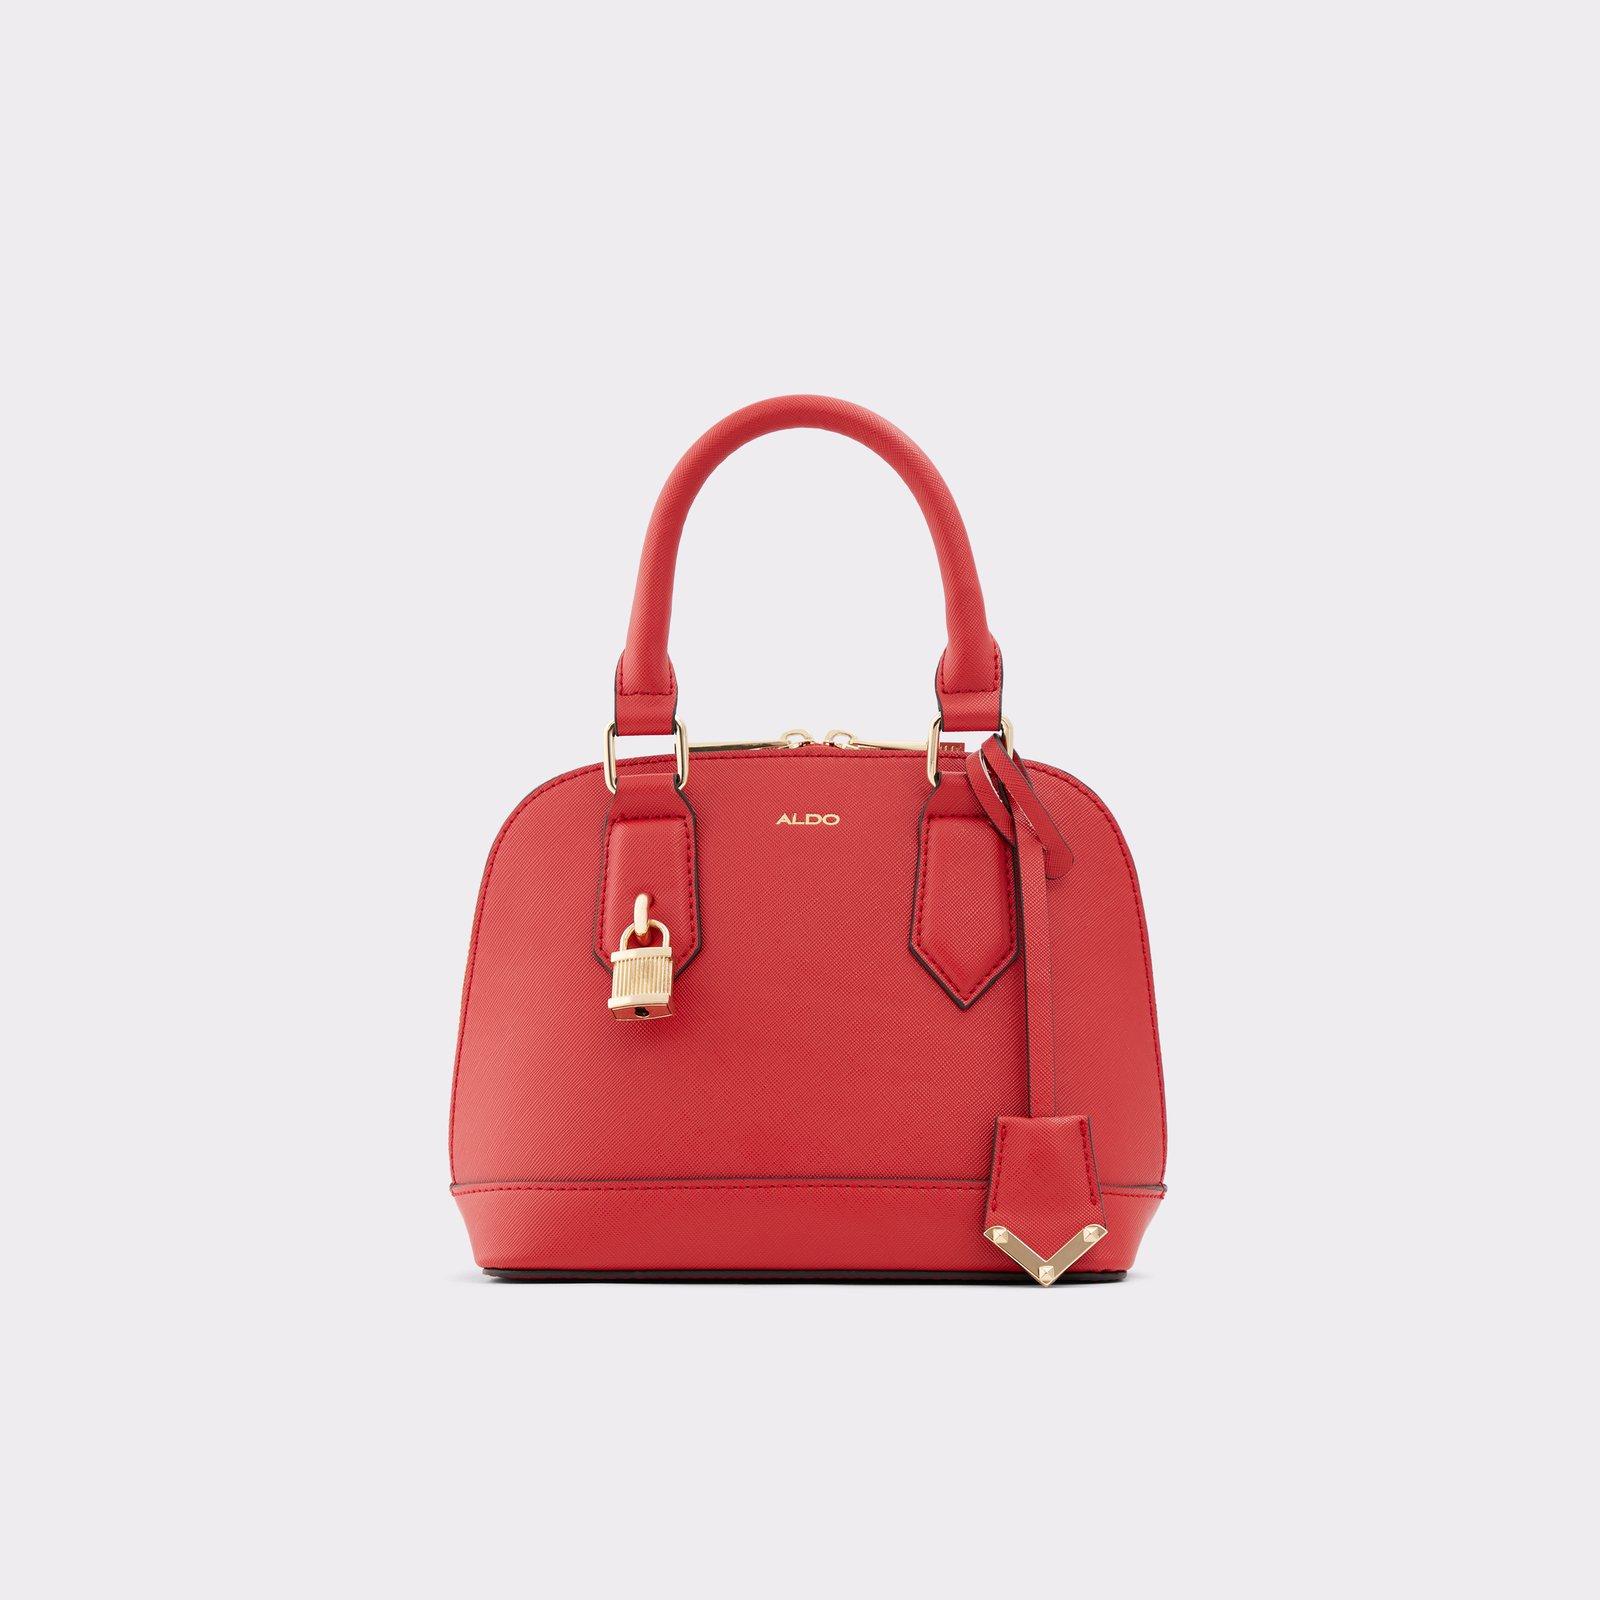 Aldo Handbags Canada Cheap Online